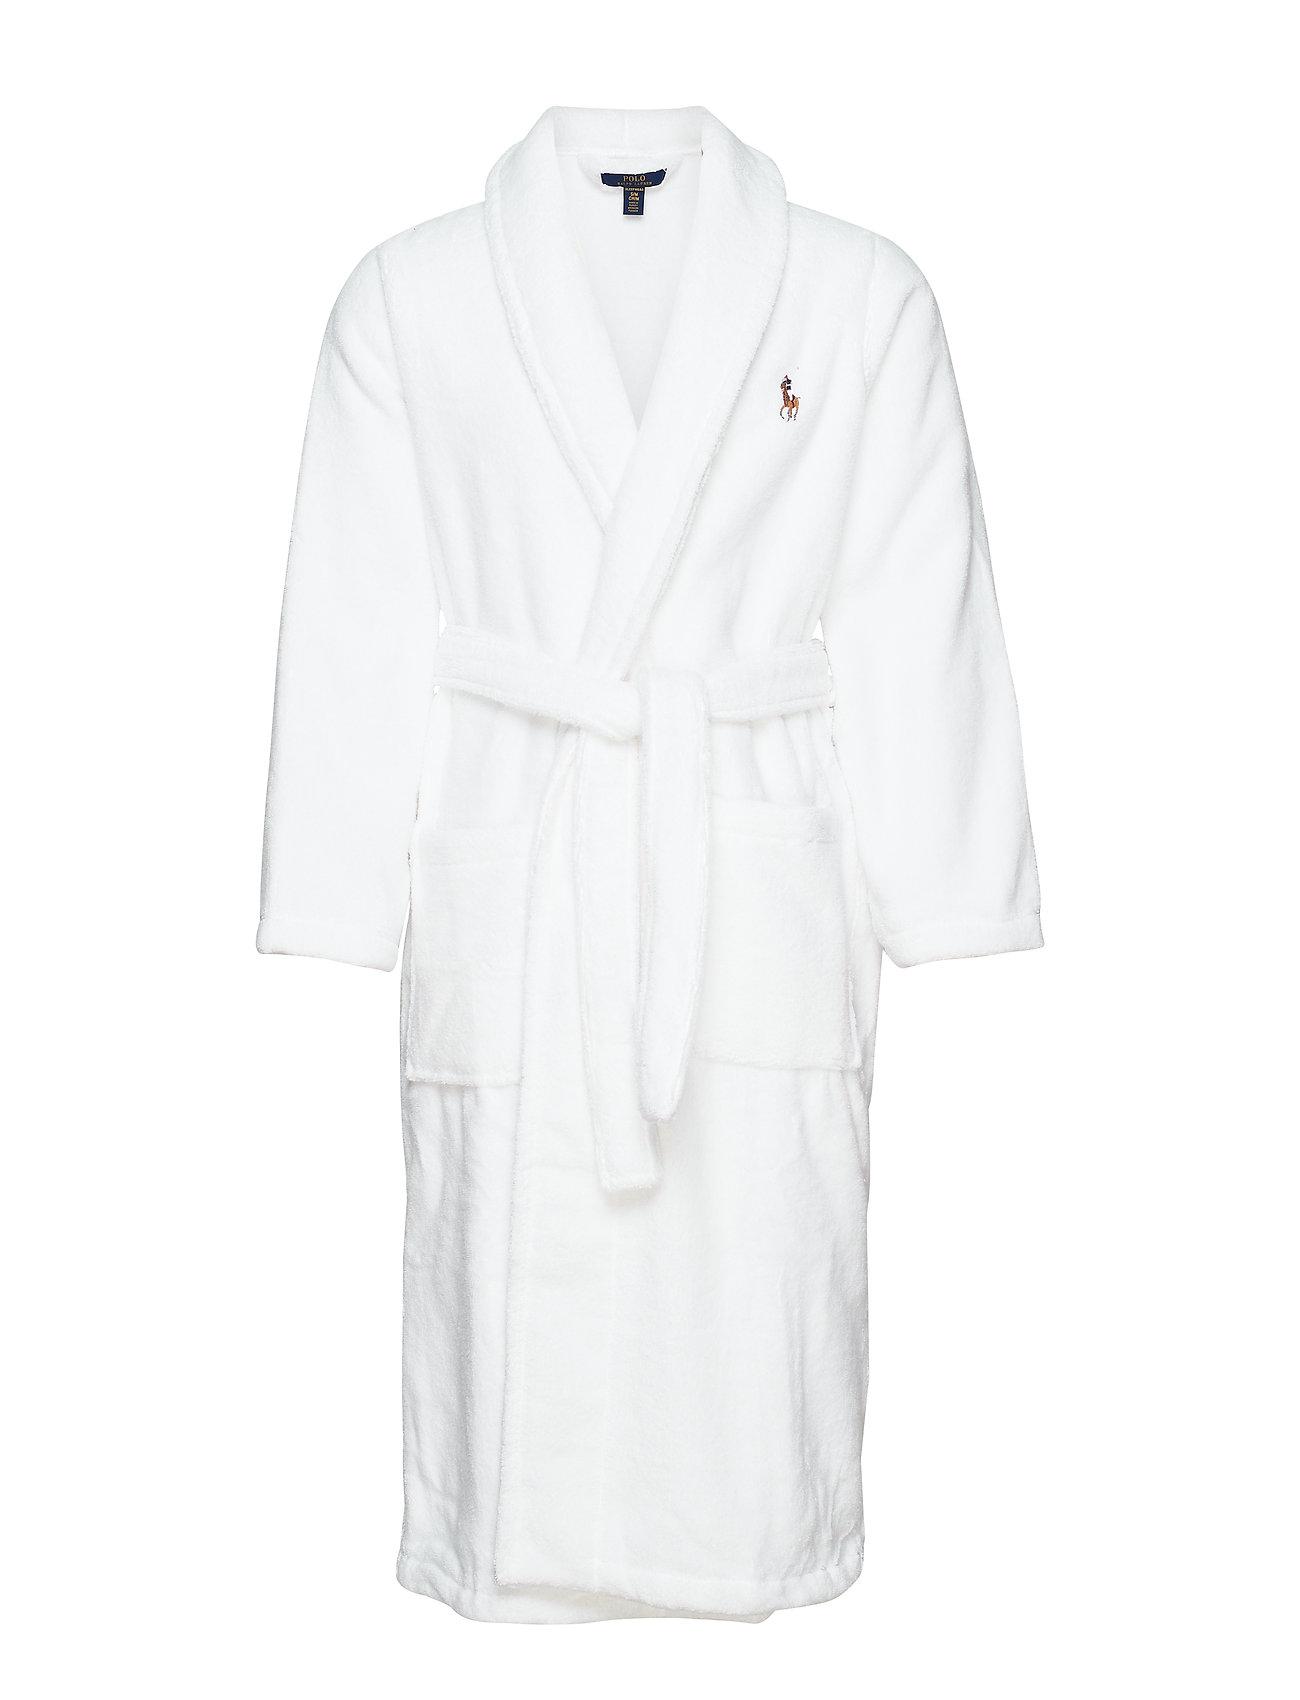 Polo Ralph Lauren Underwear COTTON/TERRY-RBE - WHITE MULTI PP